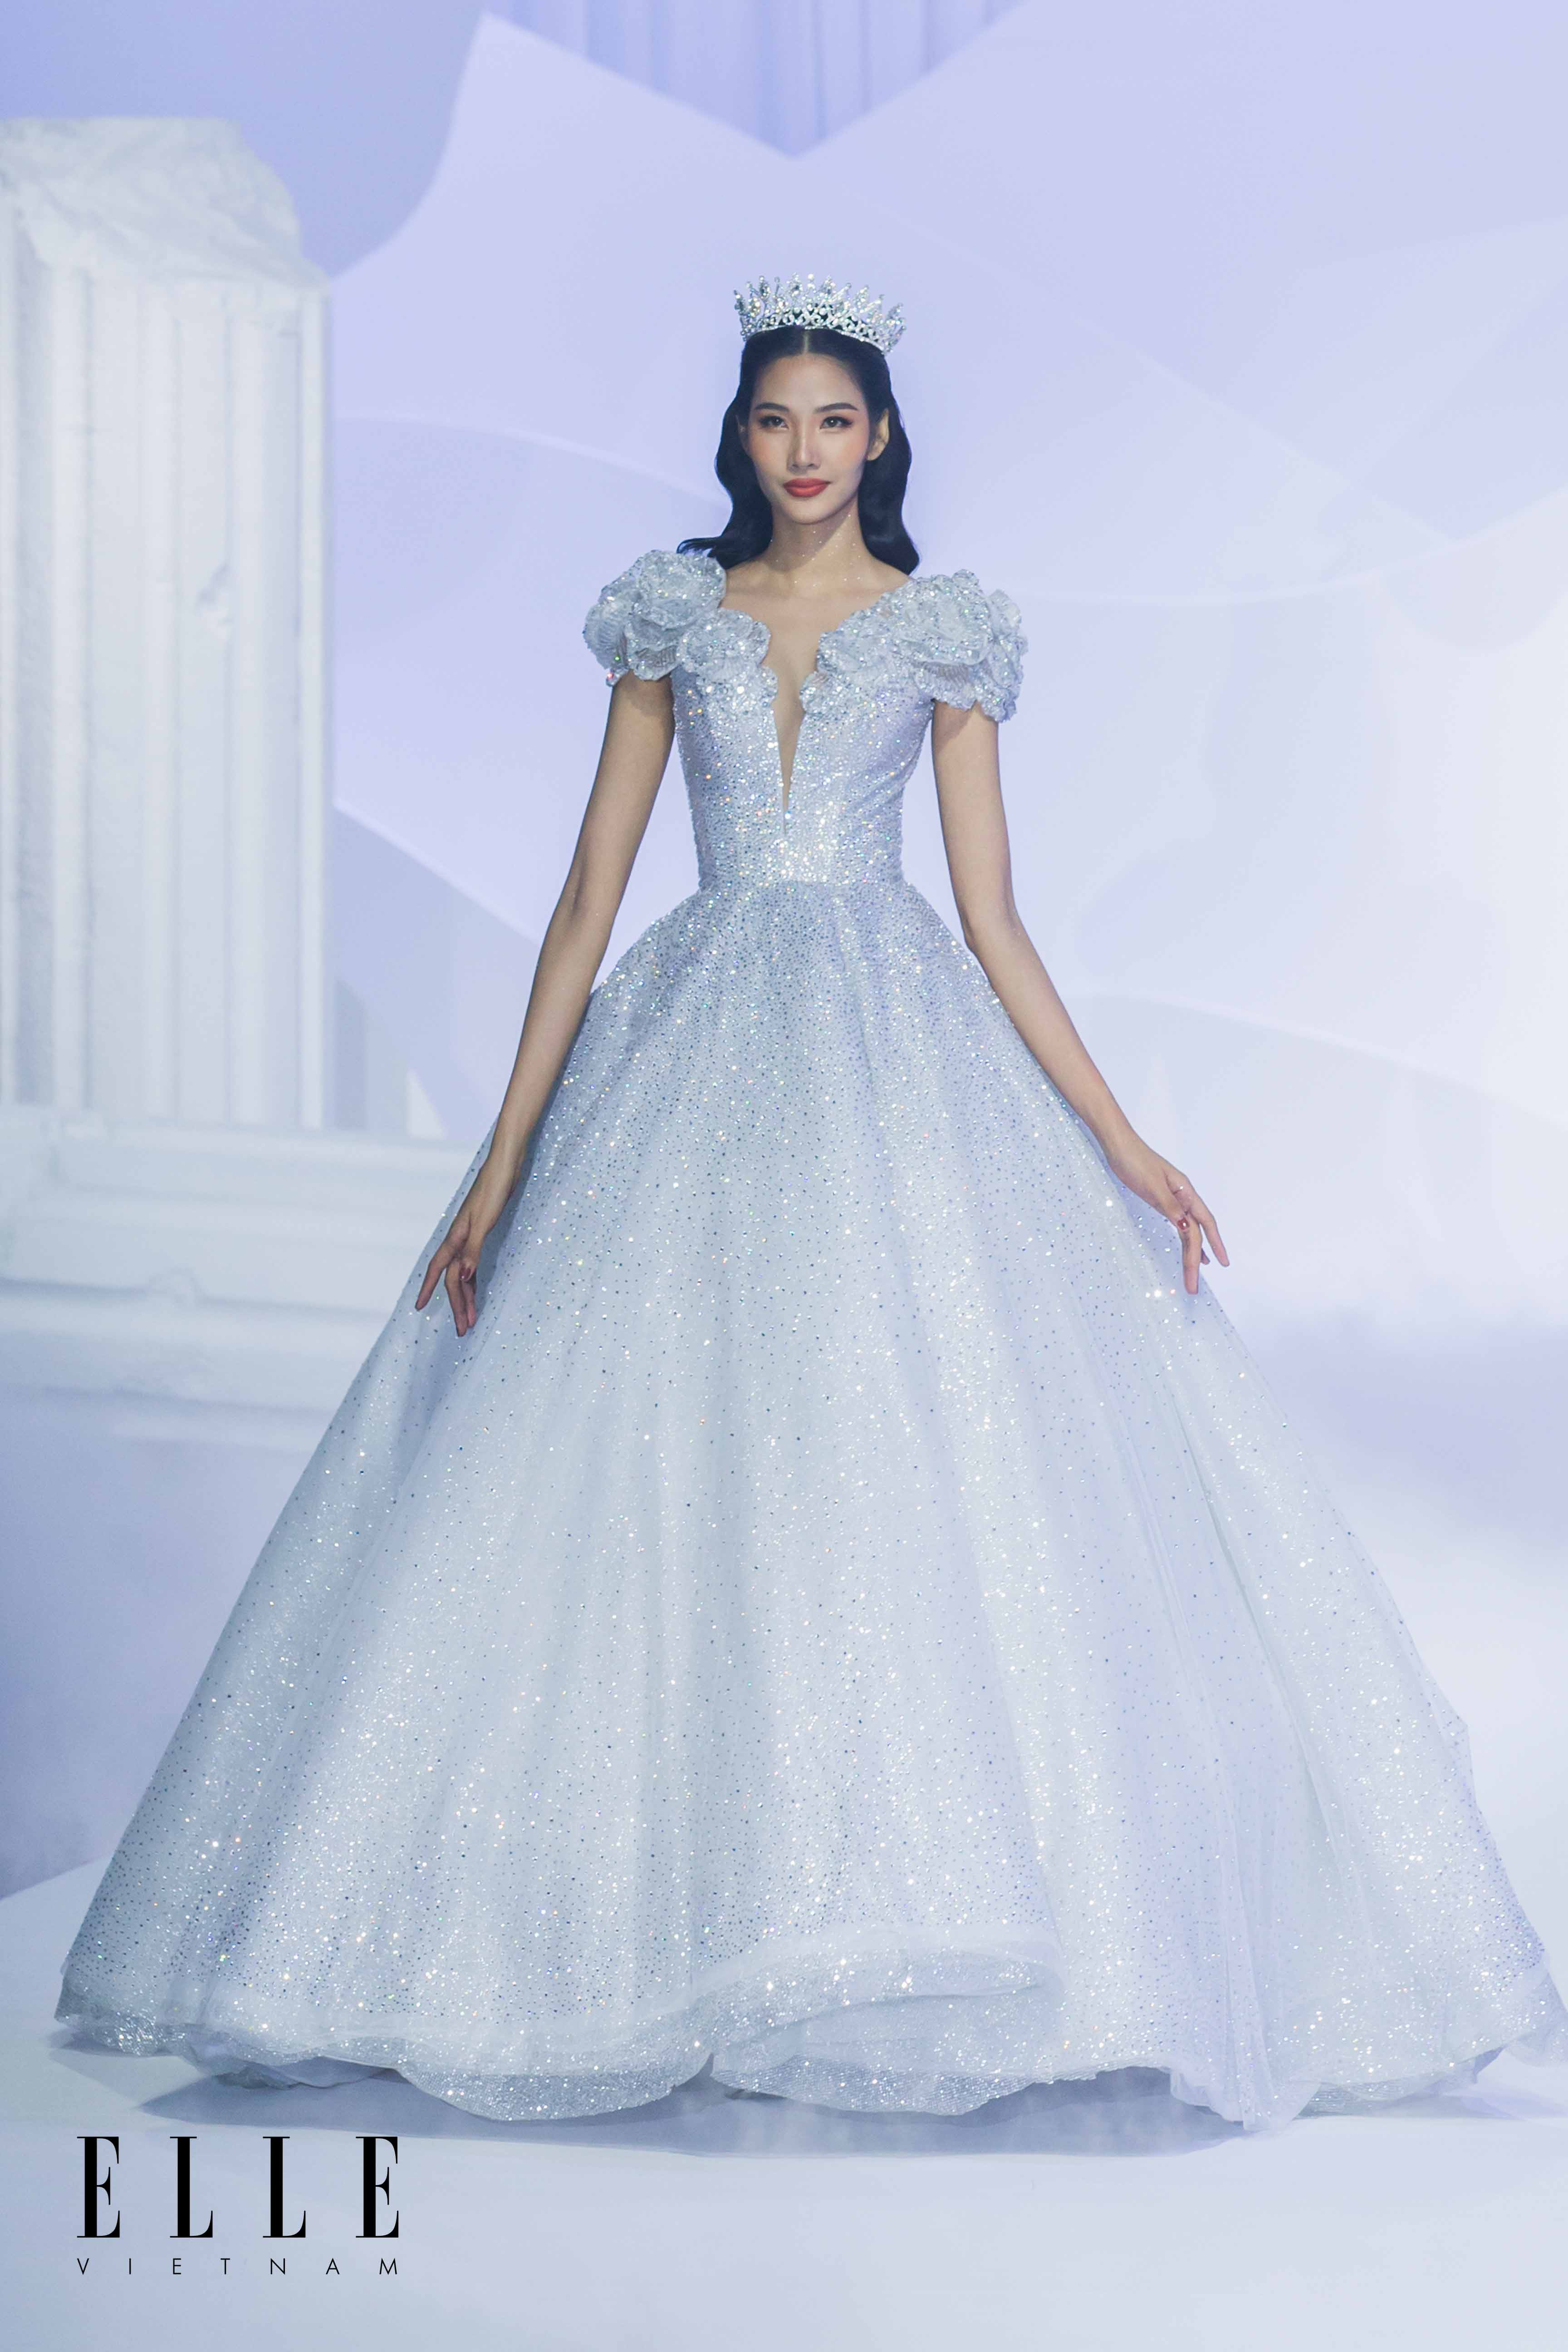 elle-wedding-art-gallery_bts-dear-my-princess-ao-cuoi-mo-man